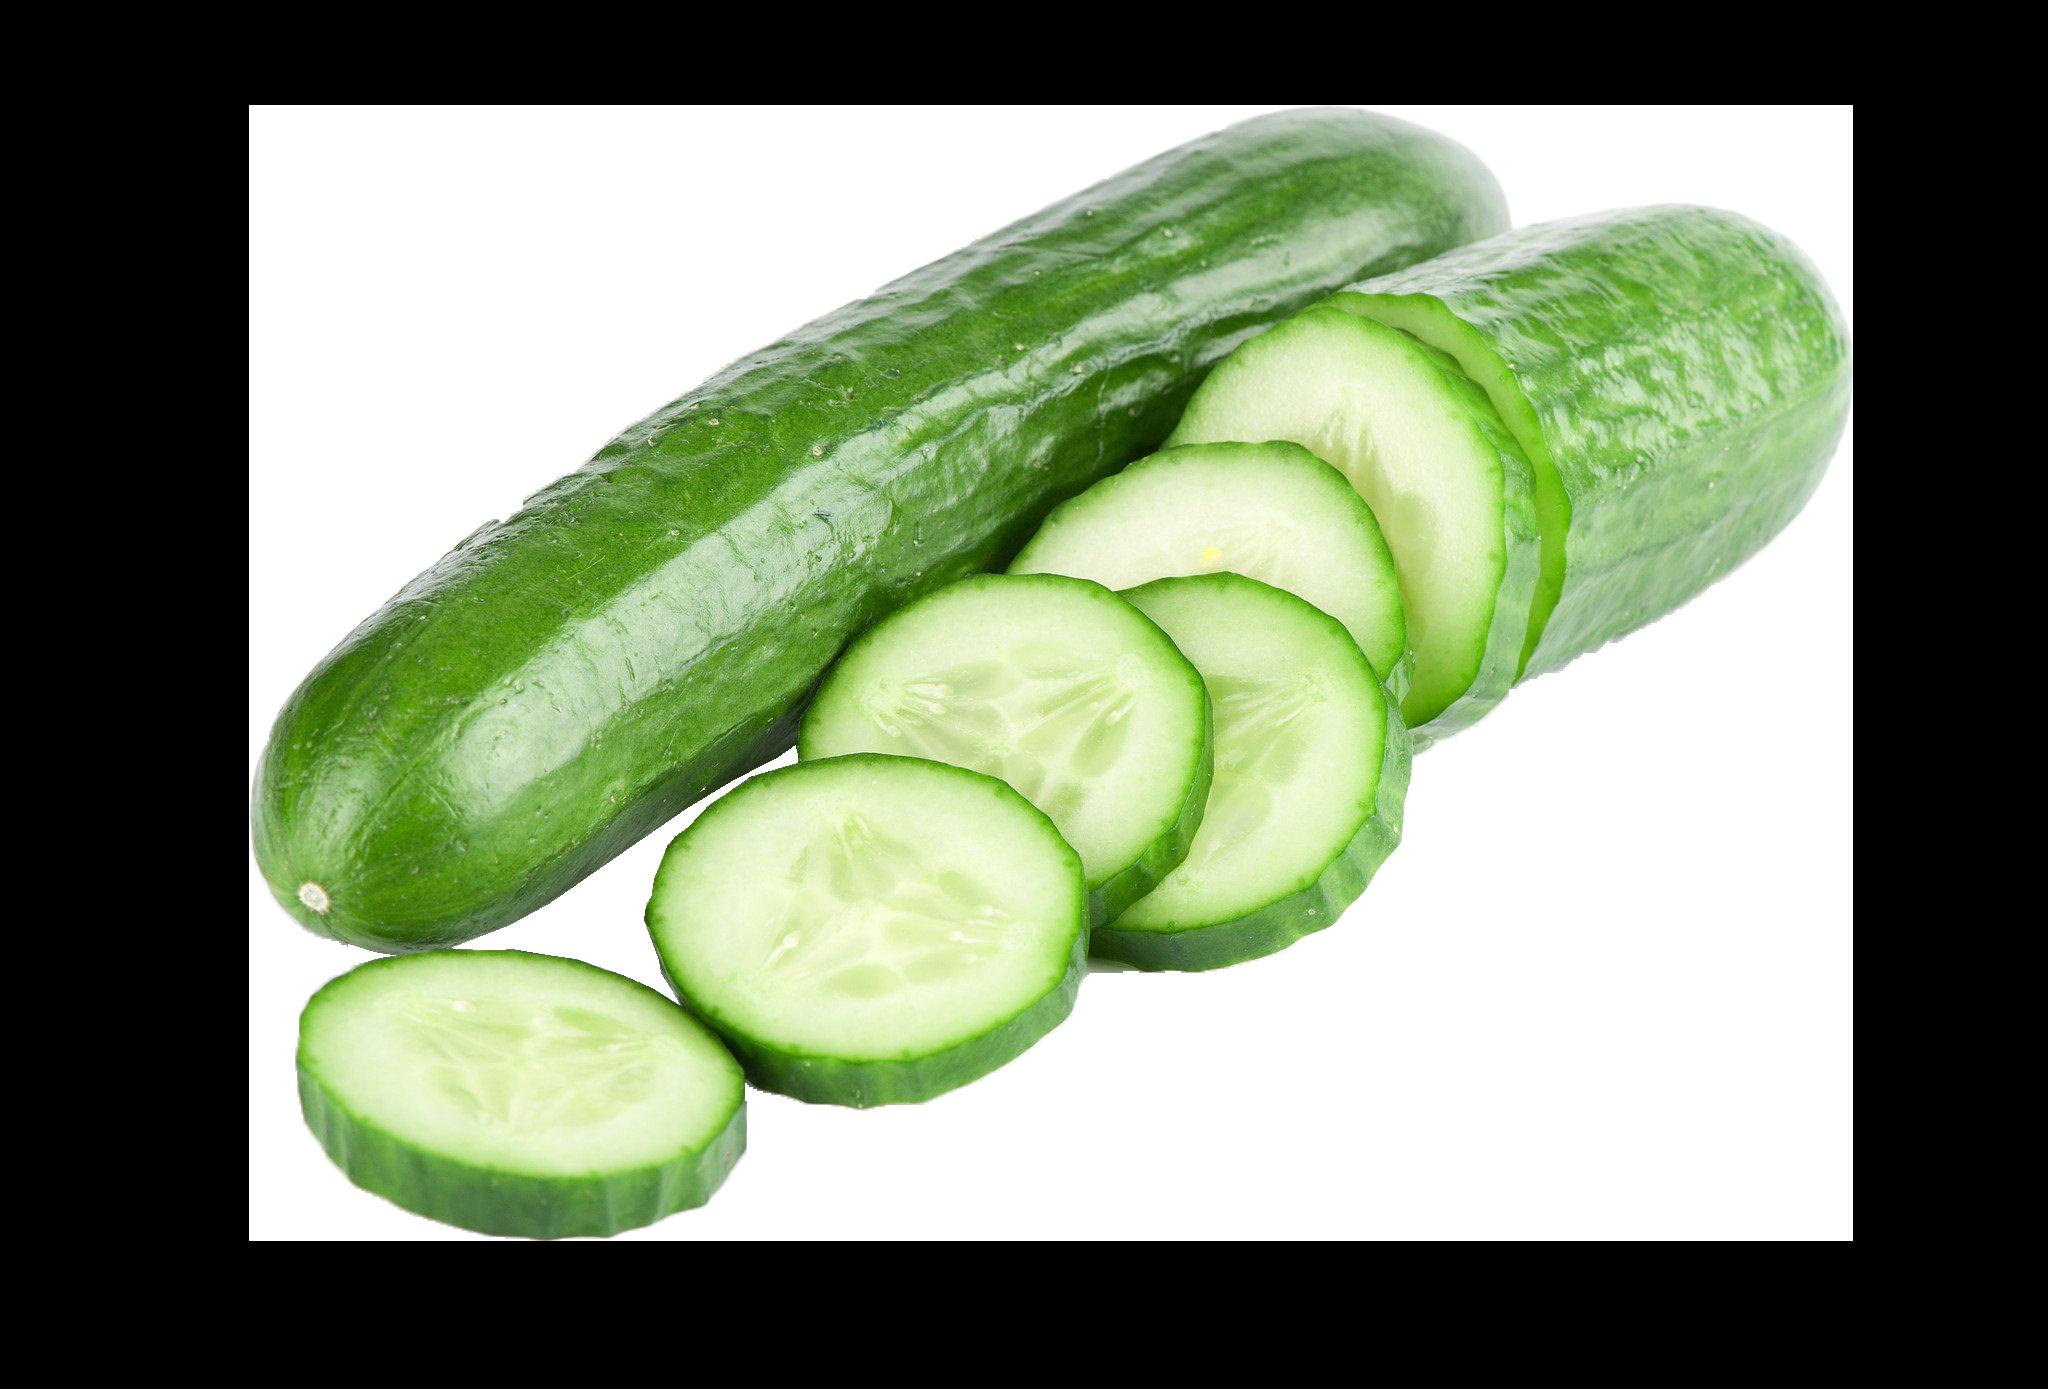 Cucumber PNG Image.